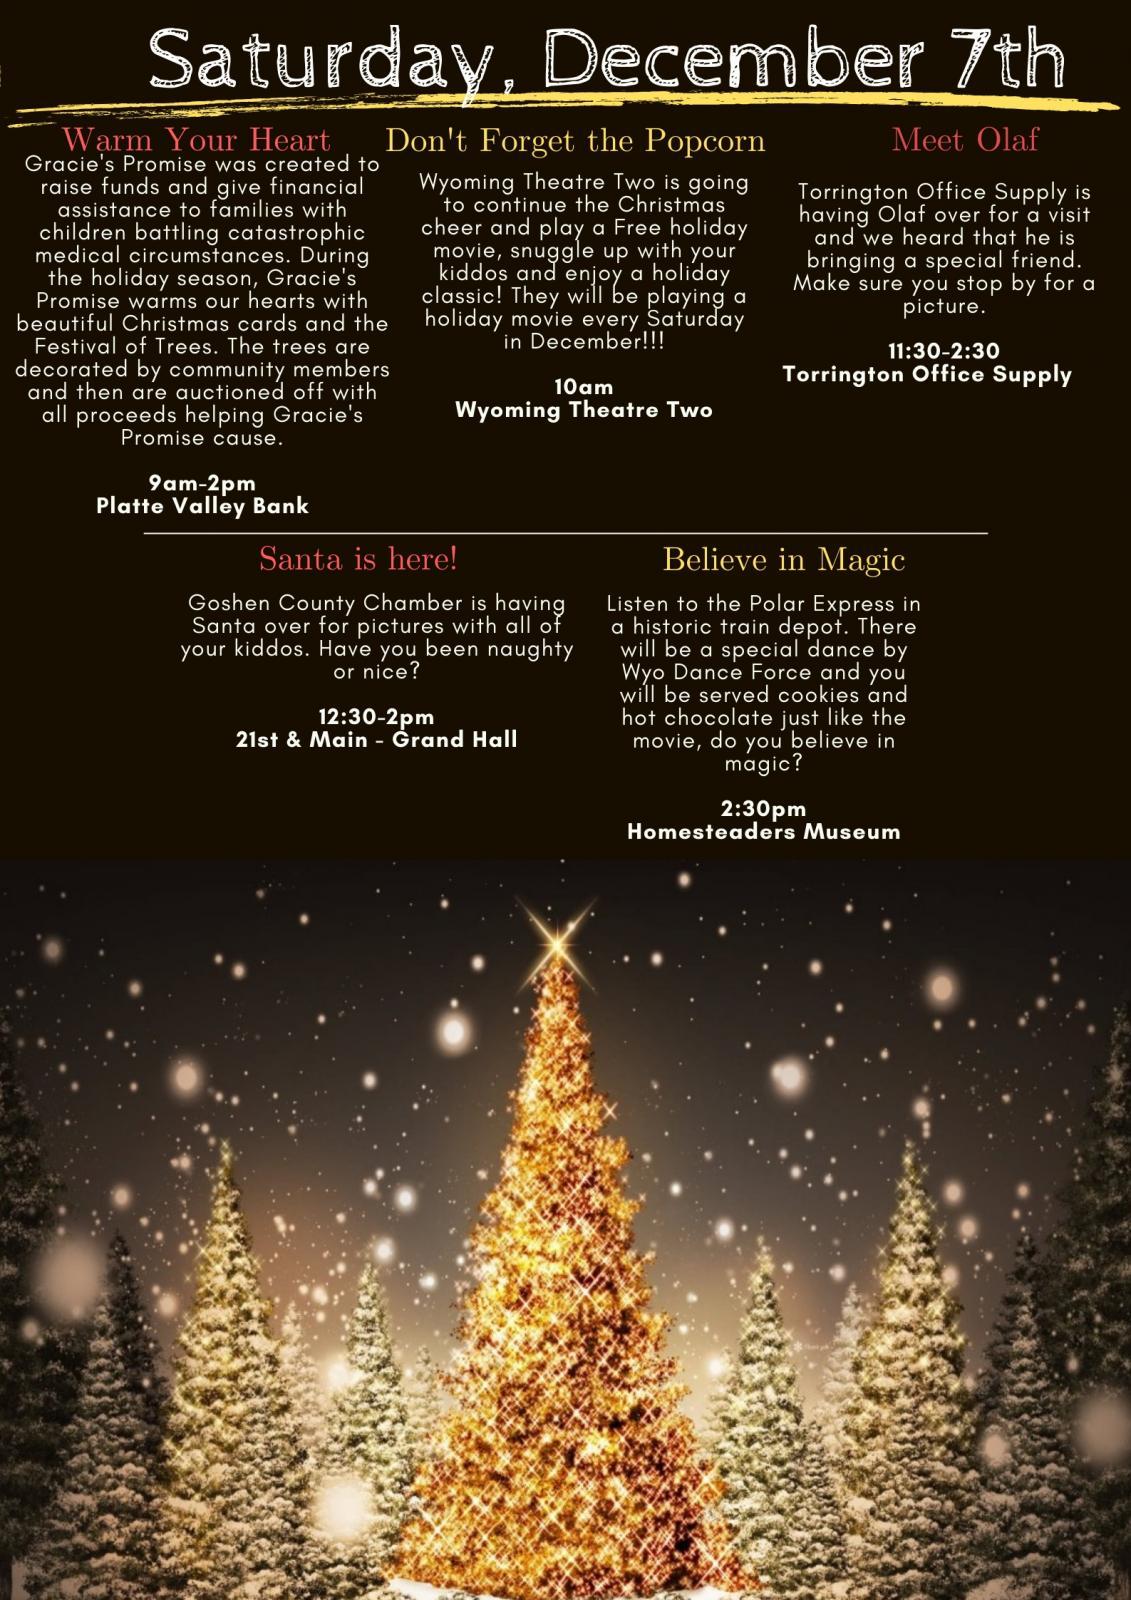 All Is Bright Christmas Celebration & Santa Photo